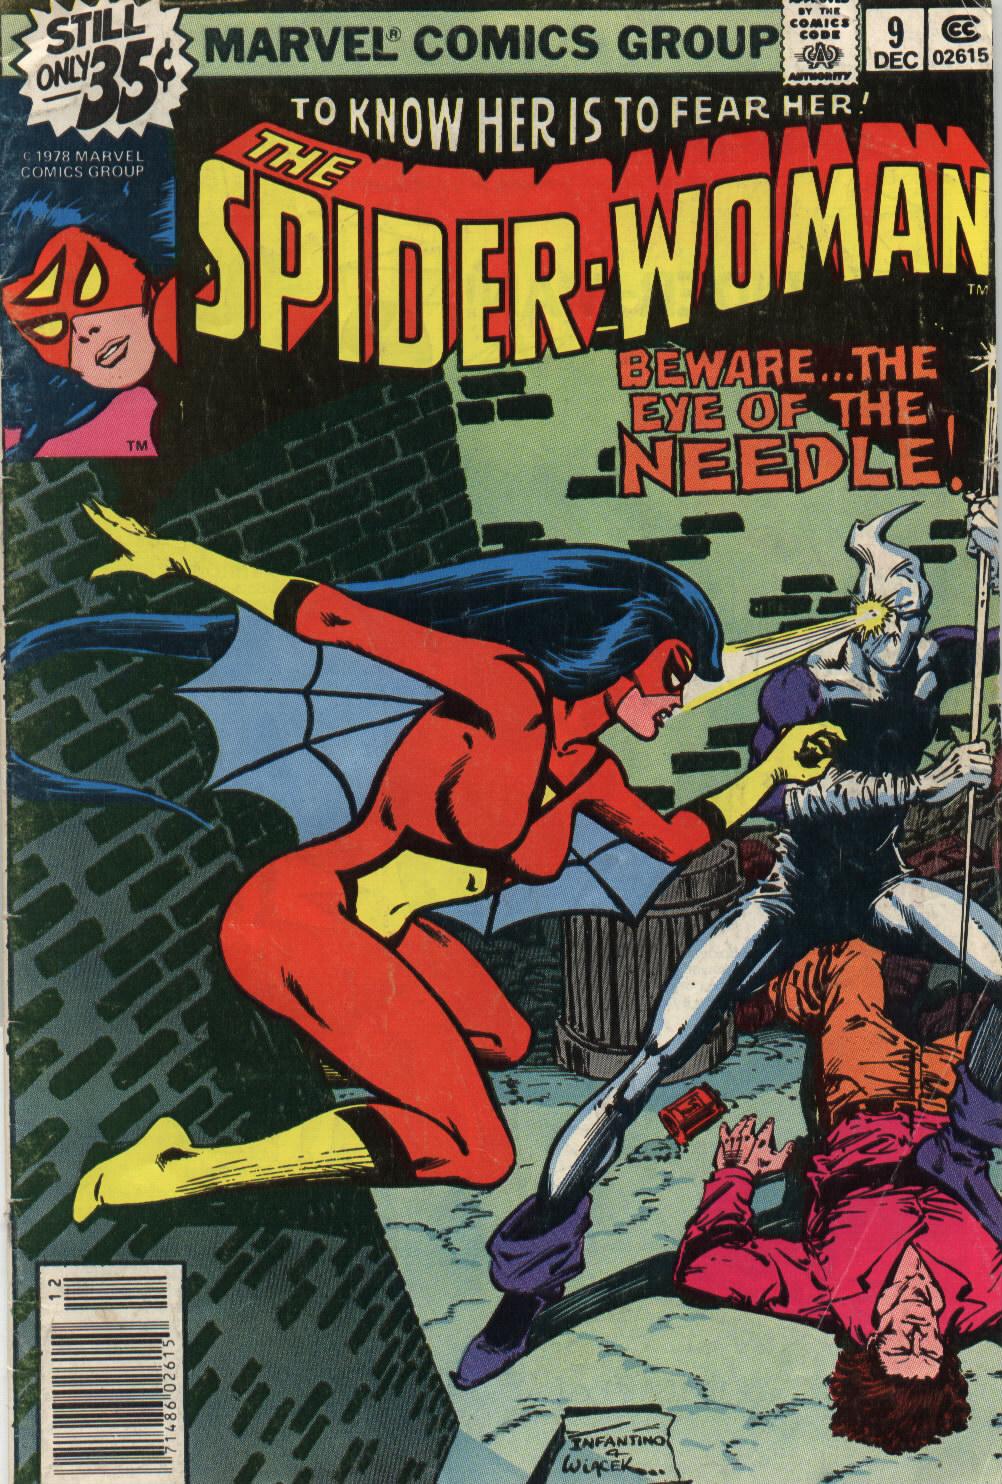 Spider-Woman (1978) #9 #42 - English 1